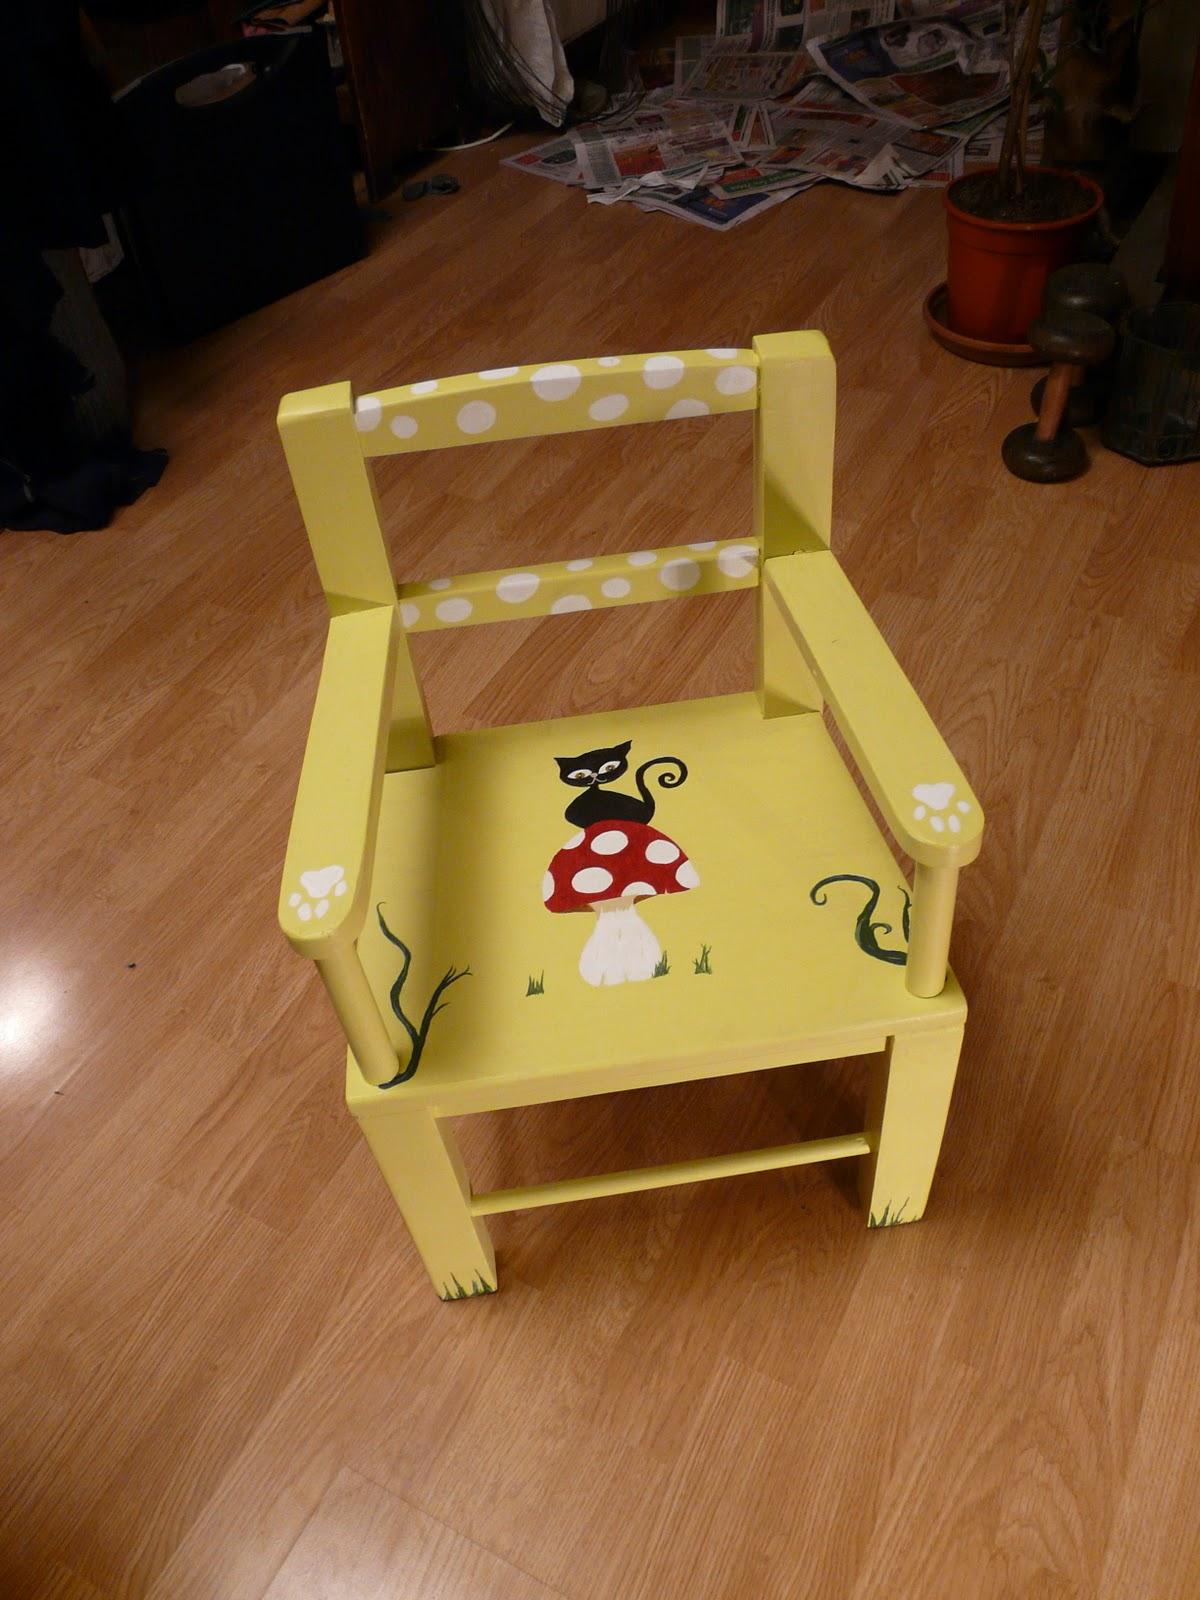 camille coursault chaise d 39 enfant. Black Bedroom Furniture Sets. Home Design Ideas